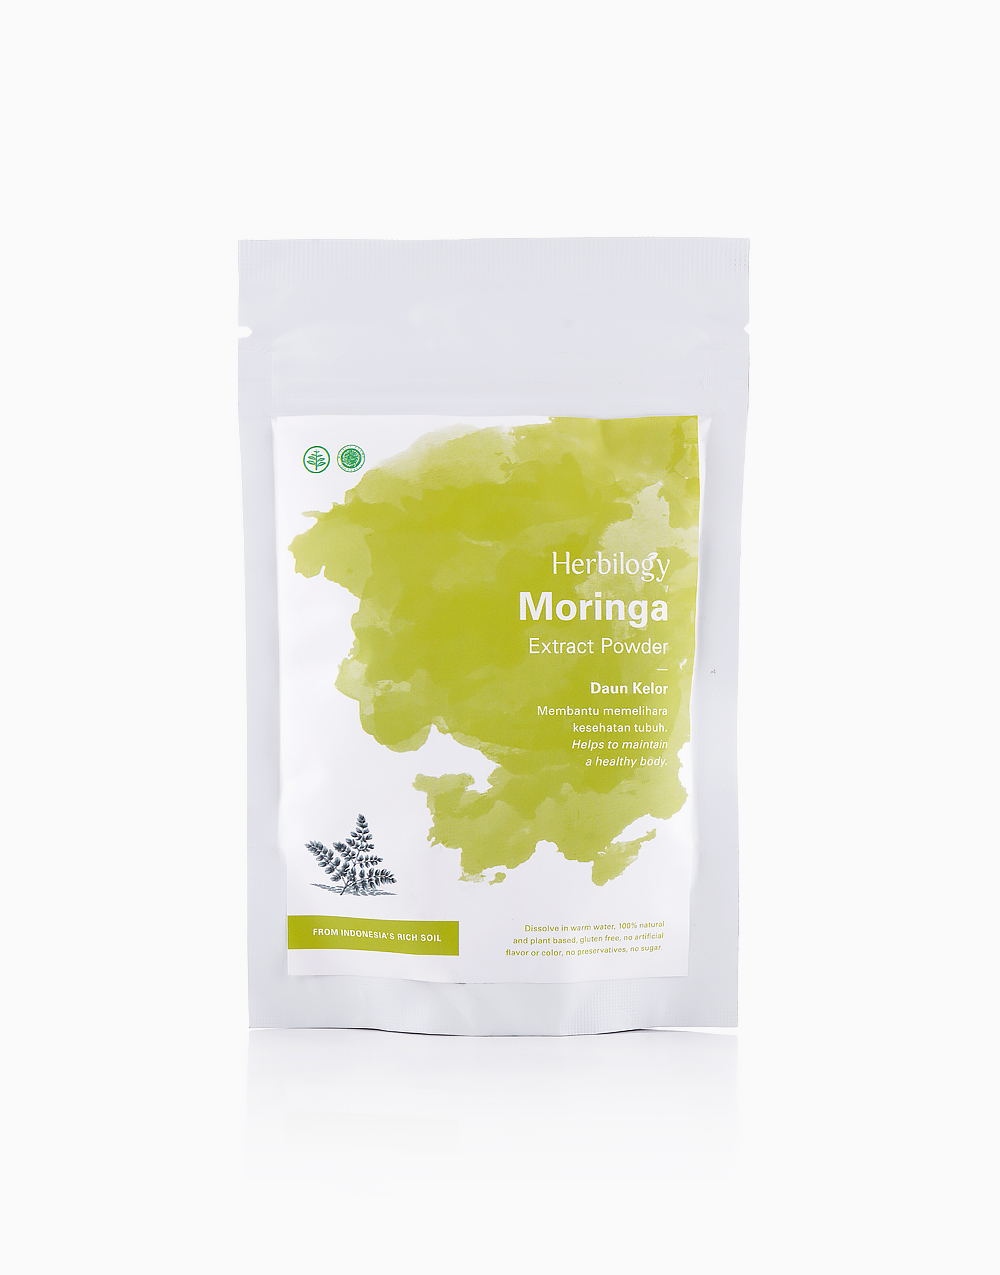 Moringa Extract Powder (100g) by Herbilogy